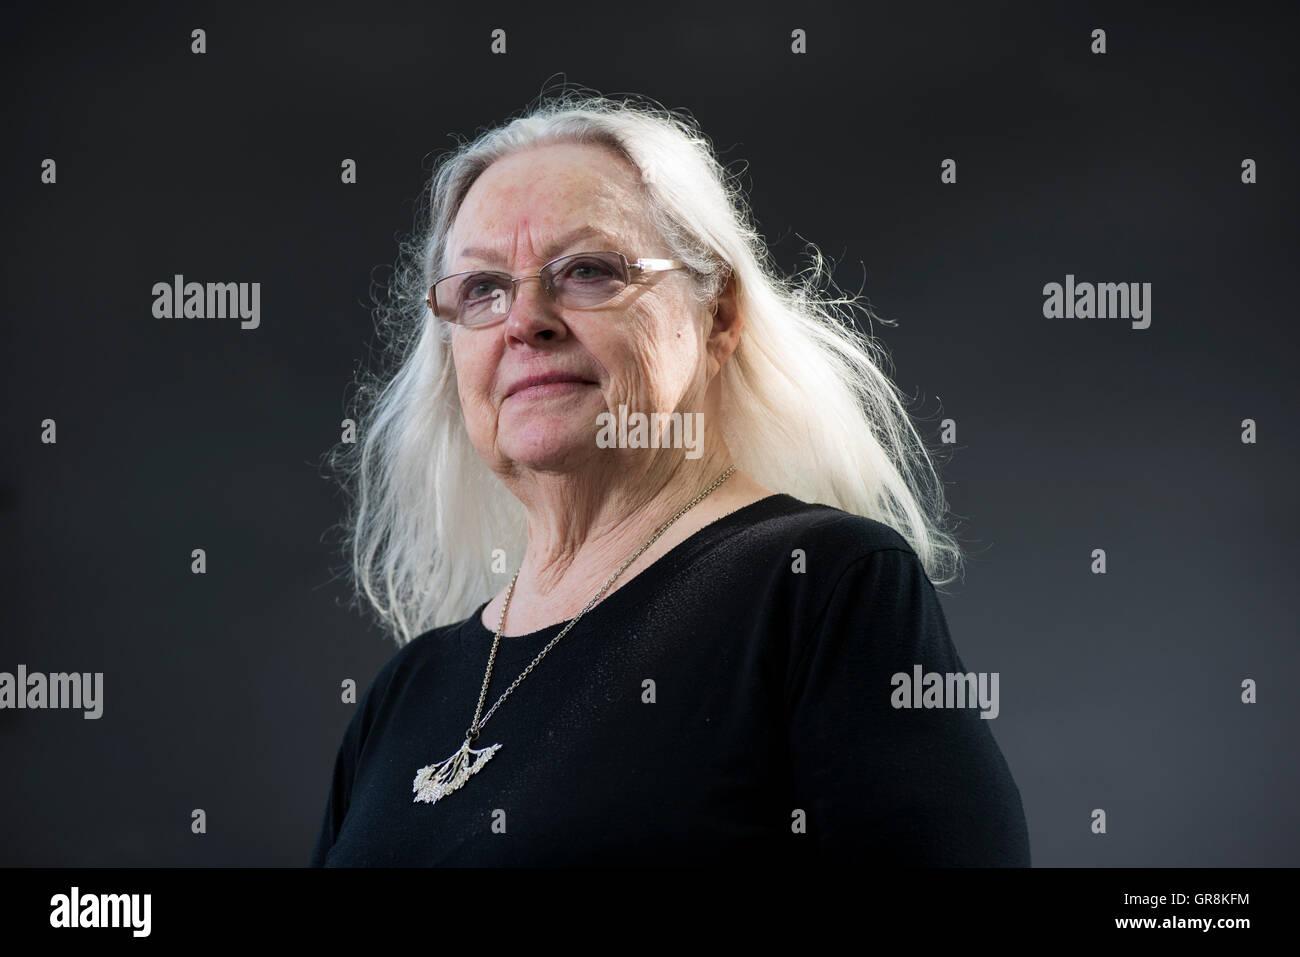 Welsh poet, playwright, editor, broadcaster, lecturer and translator Gillian Clarke. - Stock Image